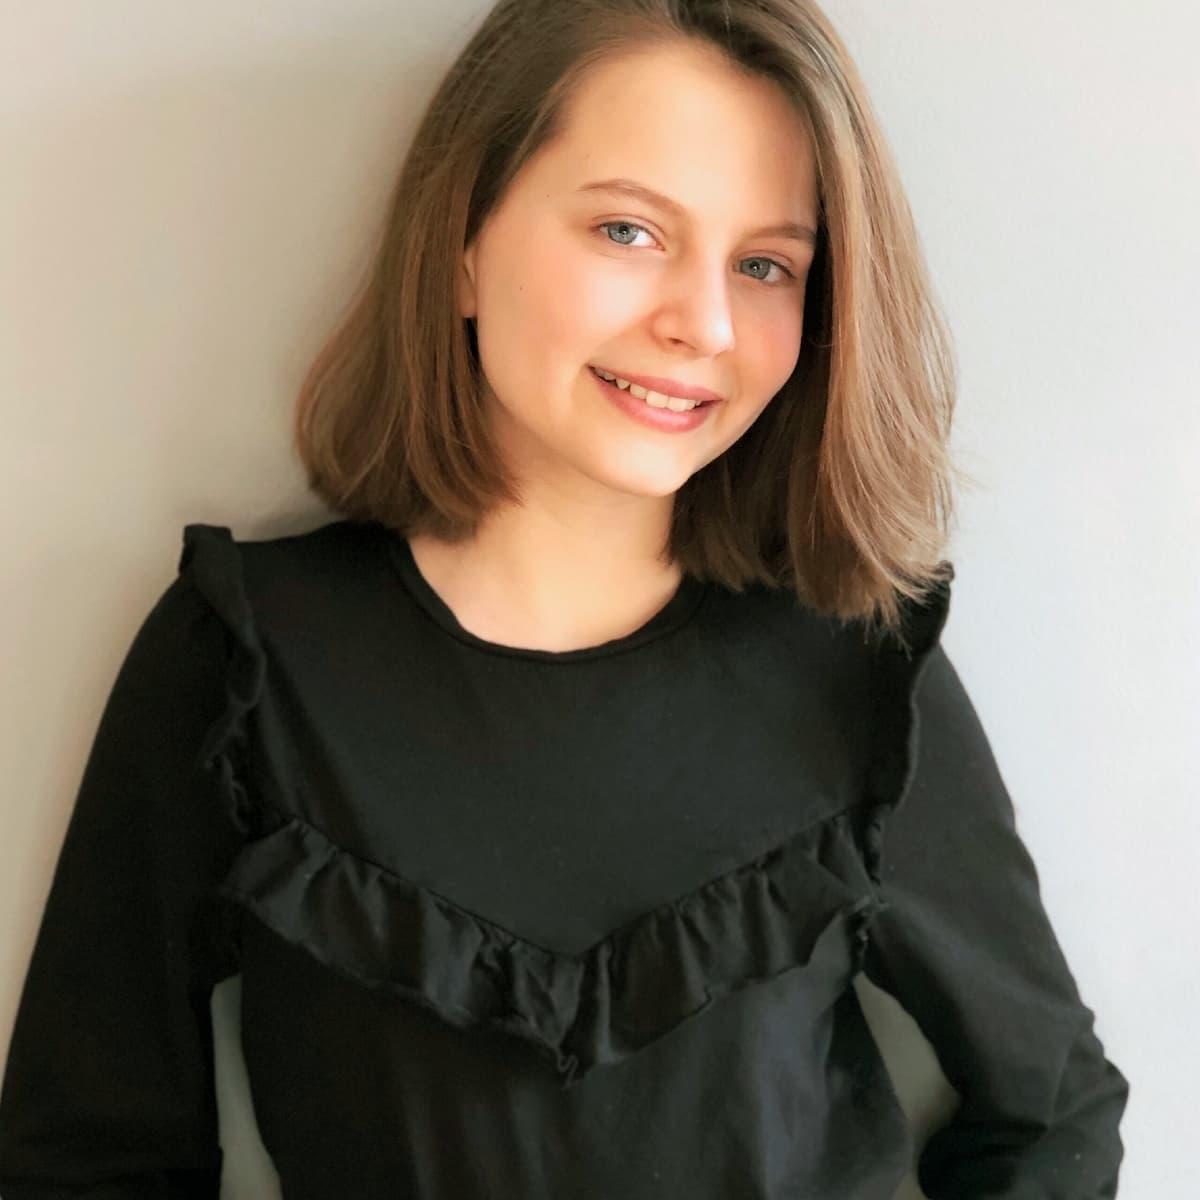 Selma Lohmann - Tänzerin bei Let's dance Kids 2021